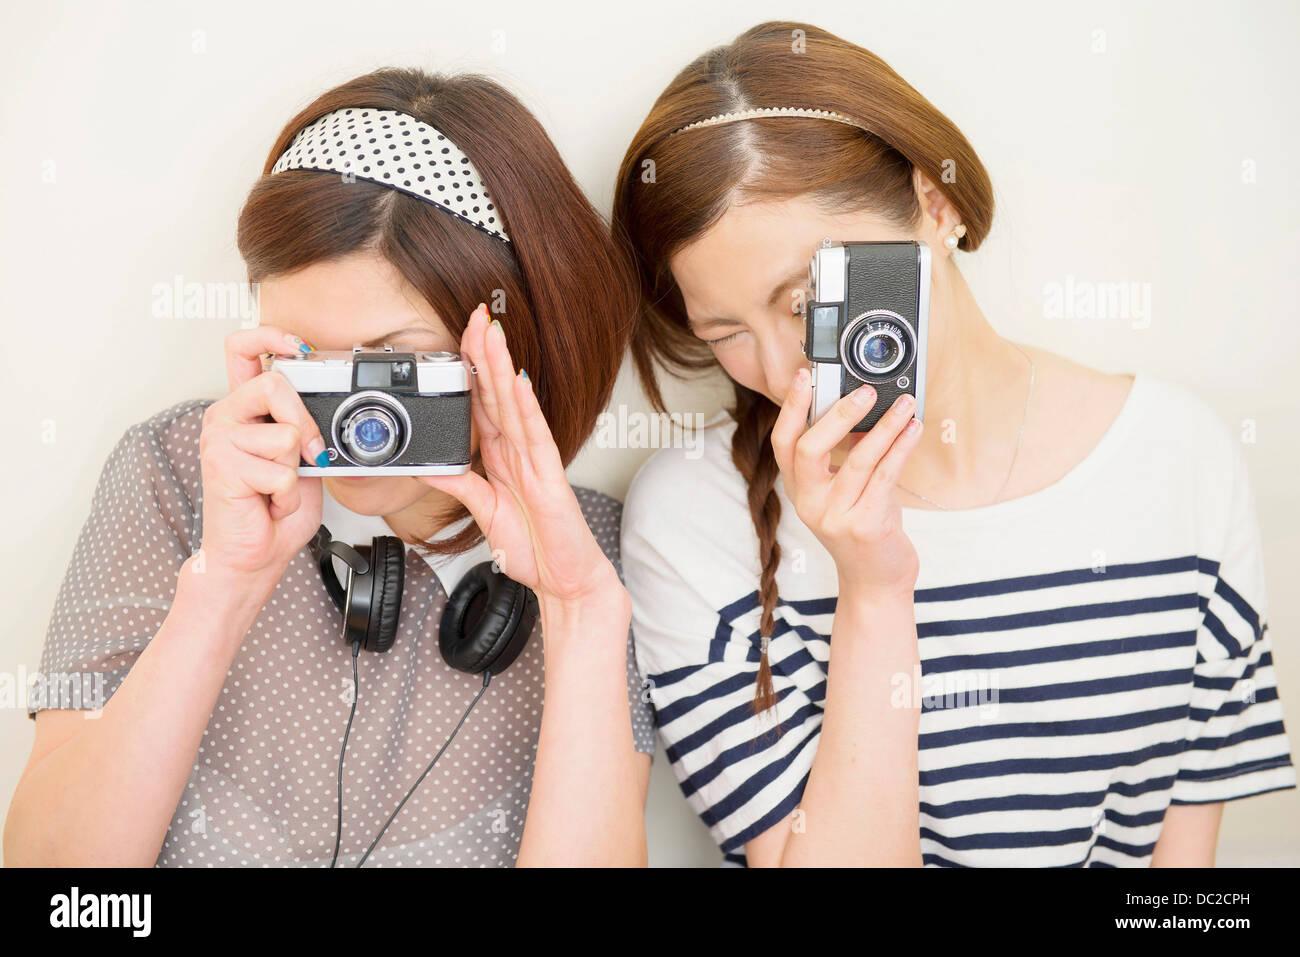 Two women taking photograph - Stock Image